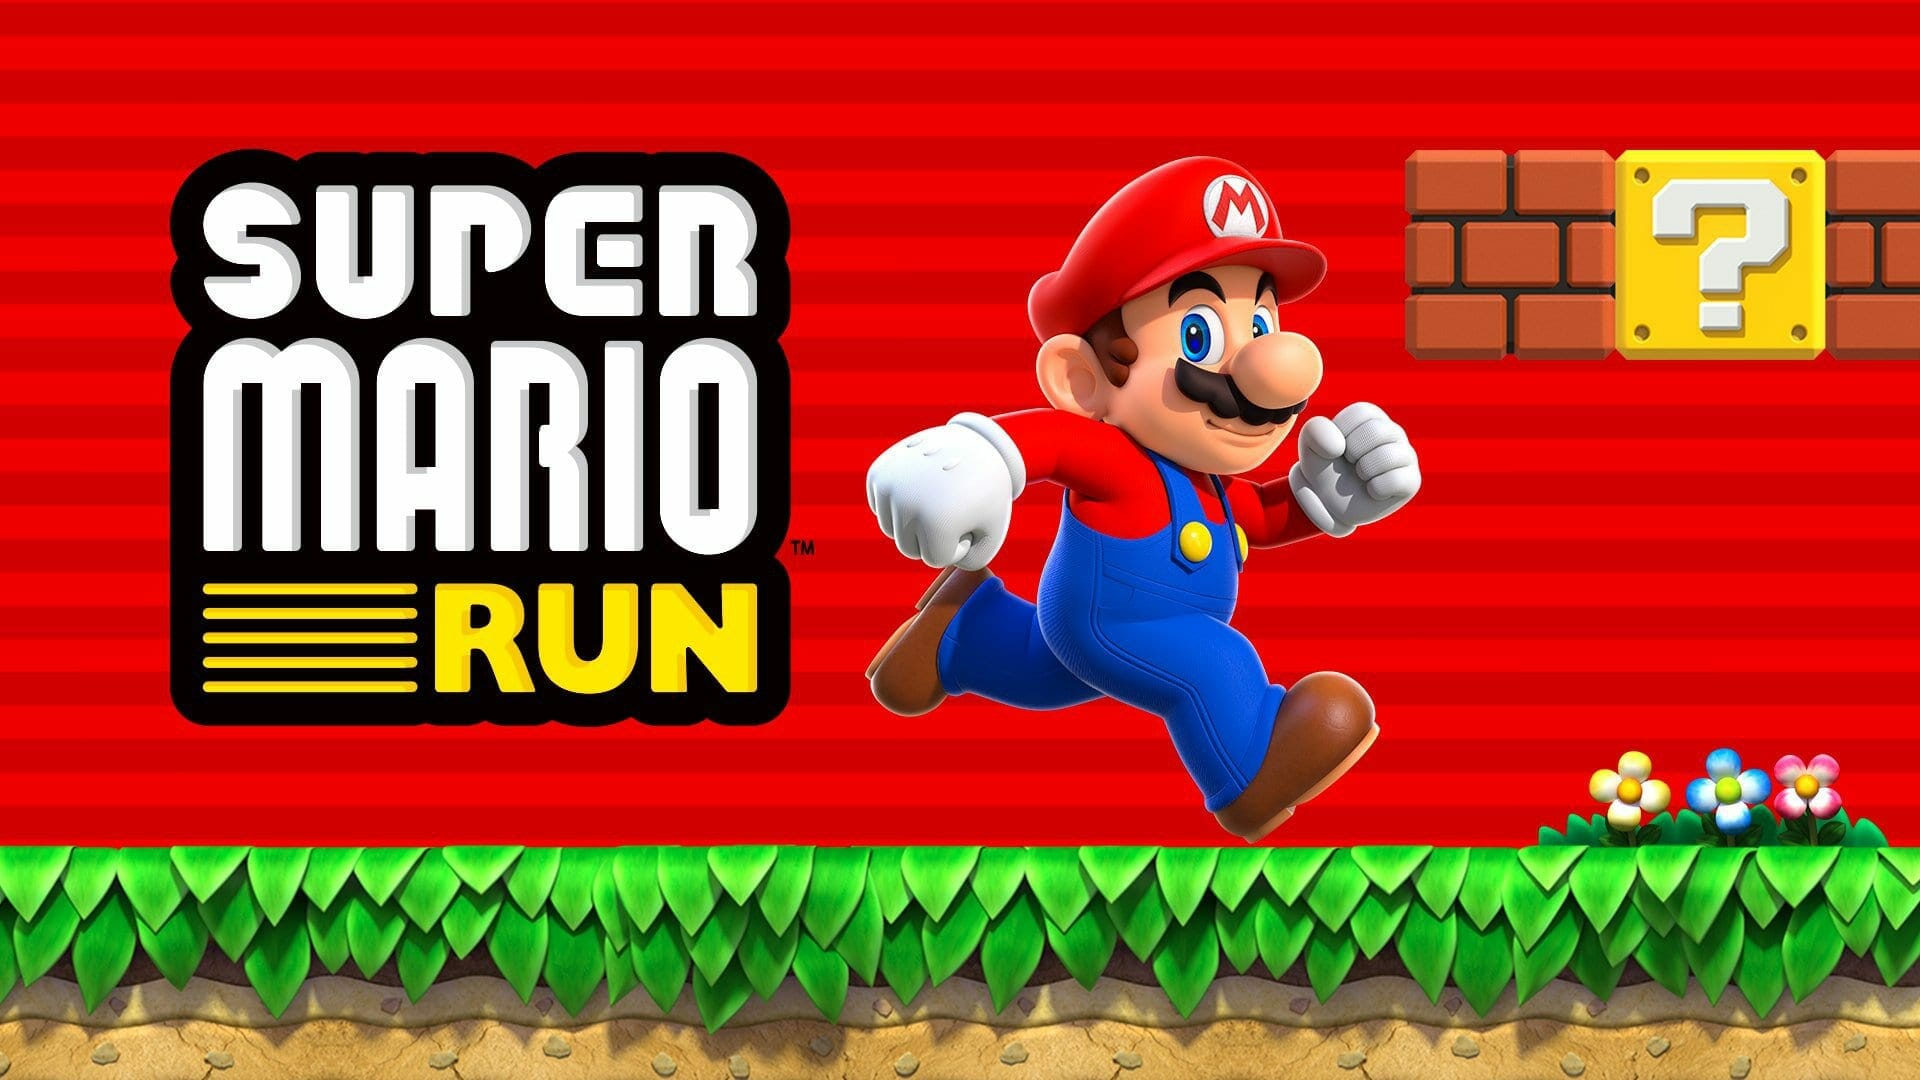 super mario run - Download Super Mario Run 2.1.1 APK for Android Devices